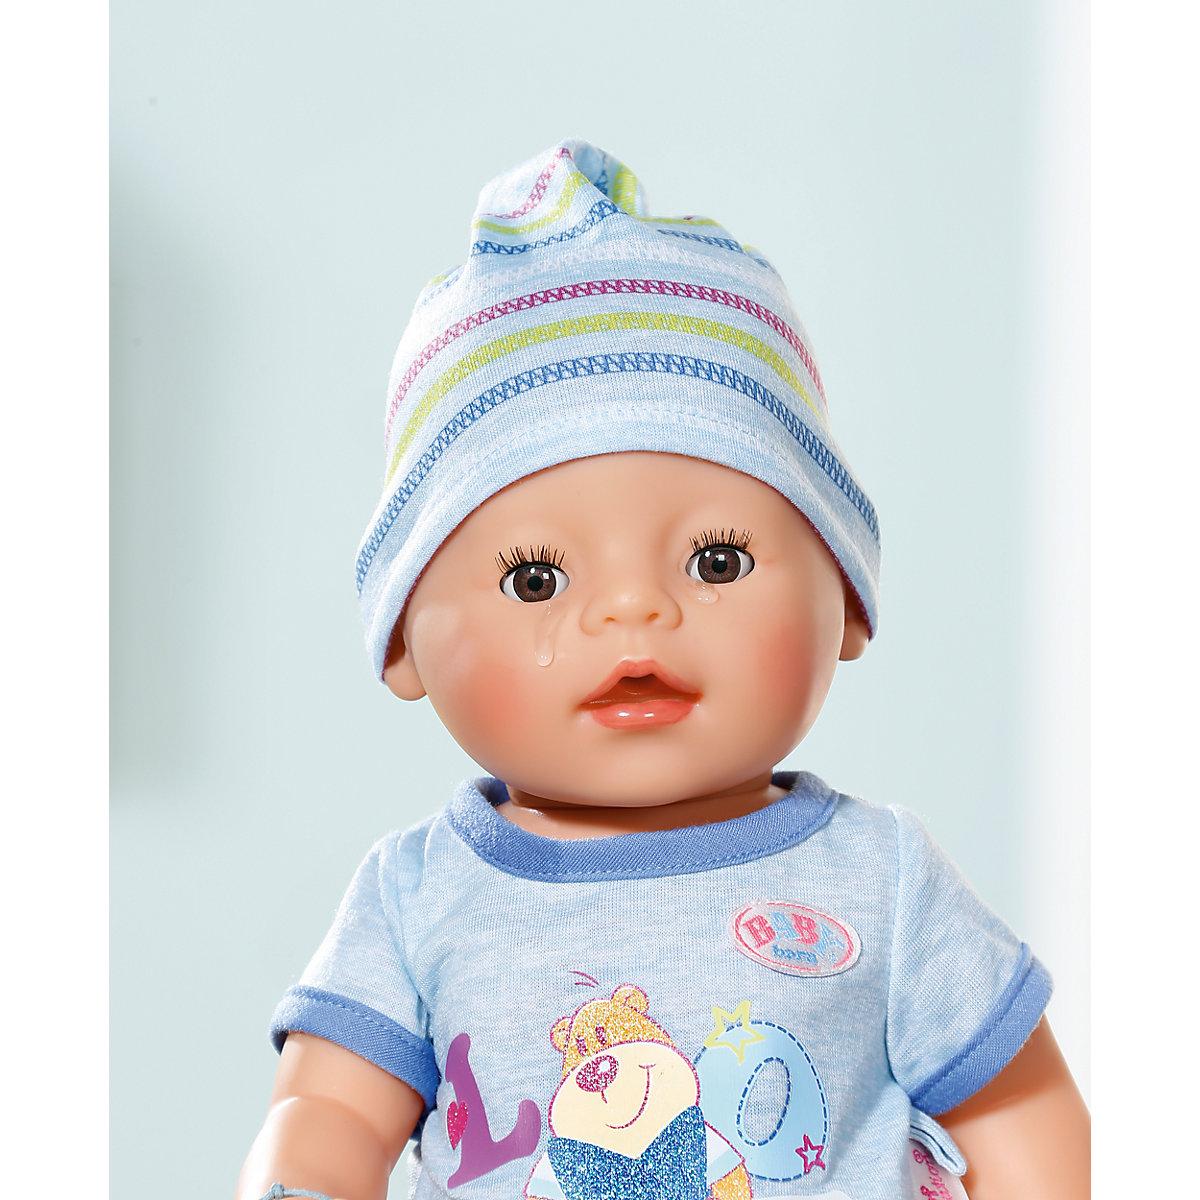 Baby Born 174 Babypuppe Interactive Boy 43 Cm Zapf Creation